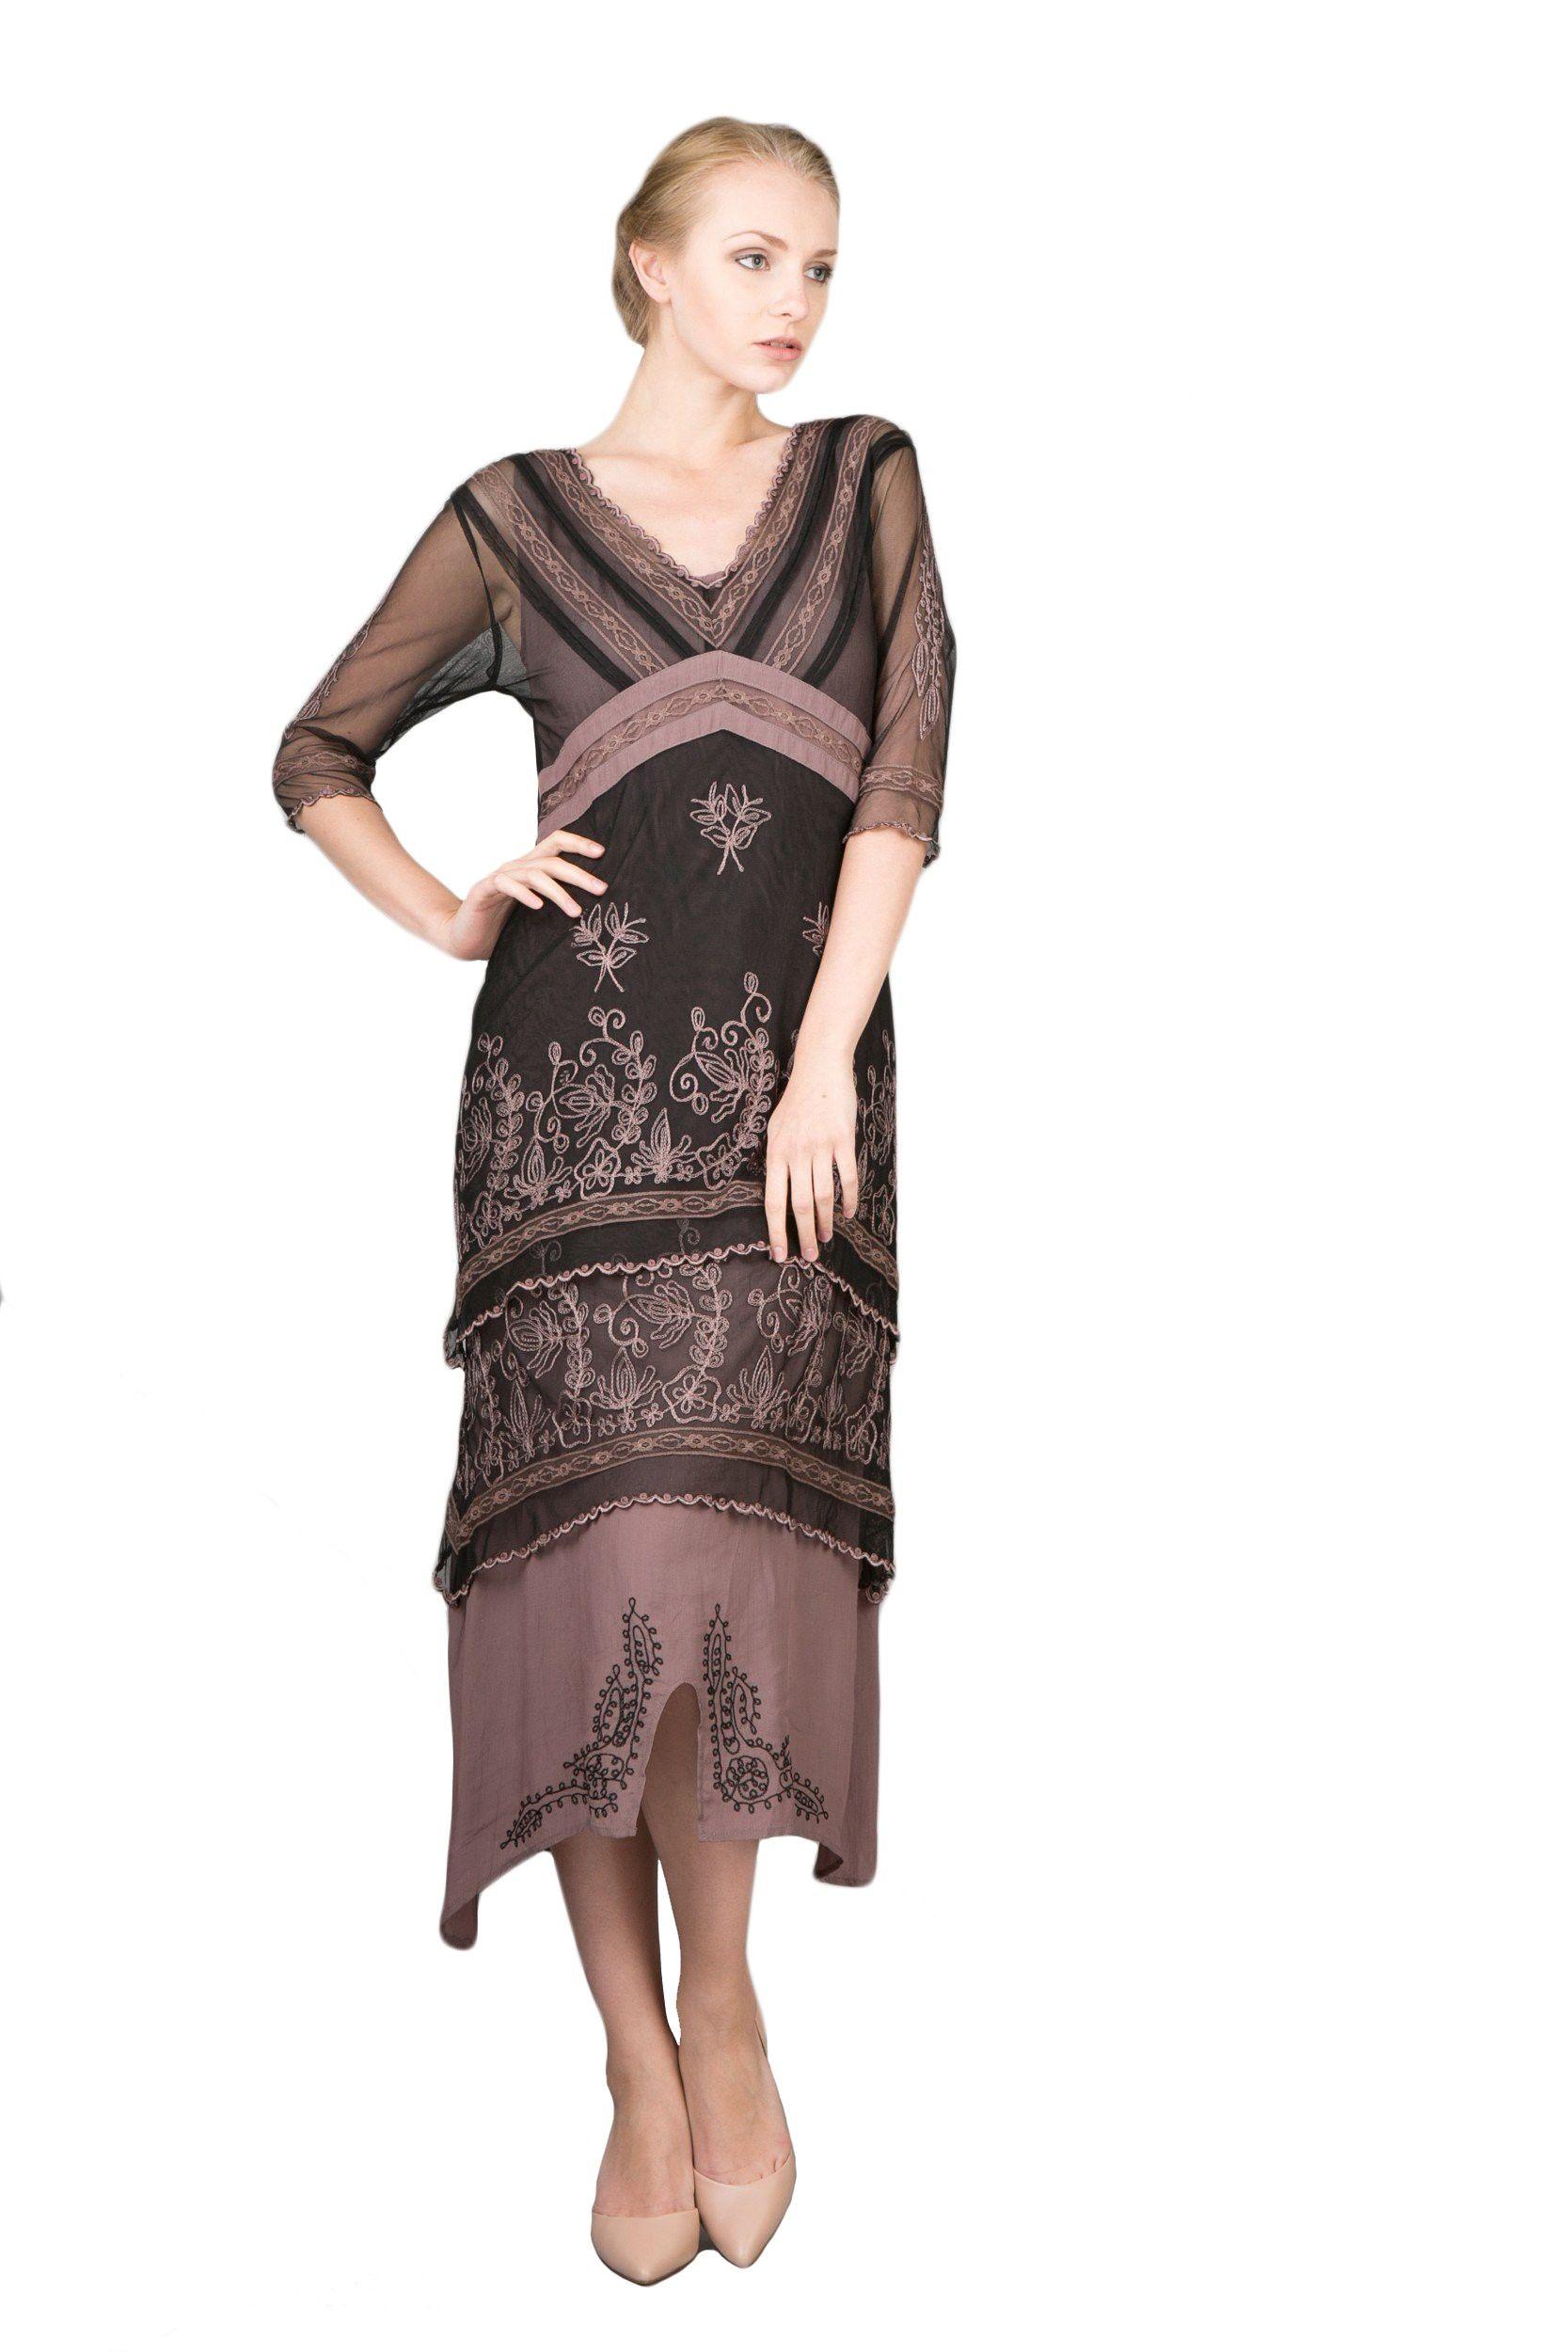 Titanic Dresses & Costumes | Pinterest